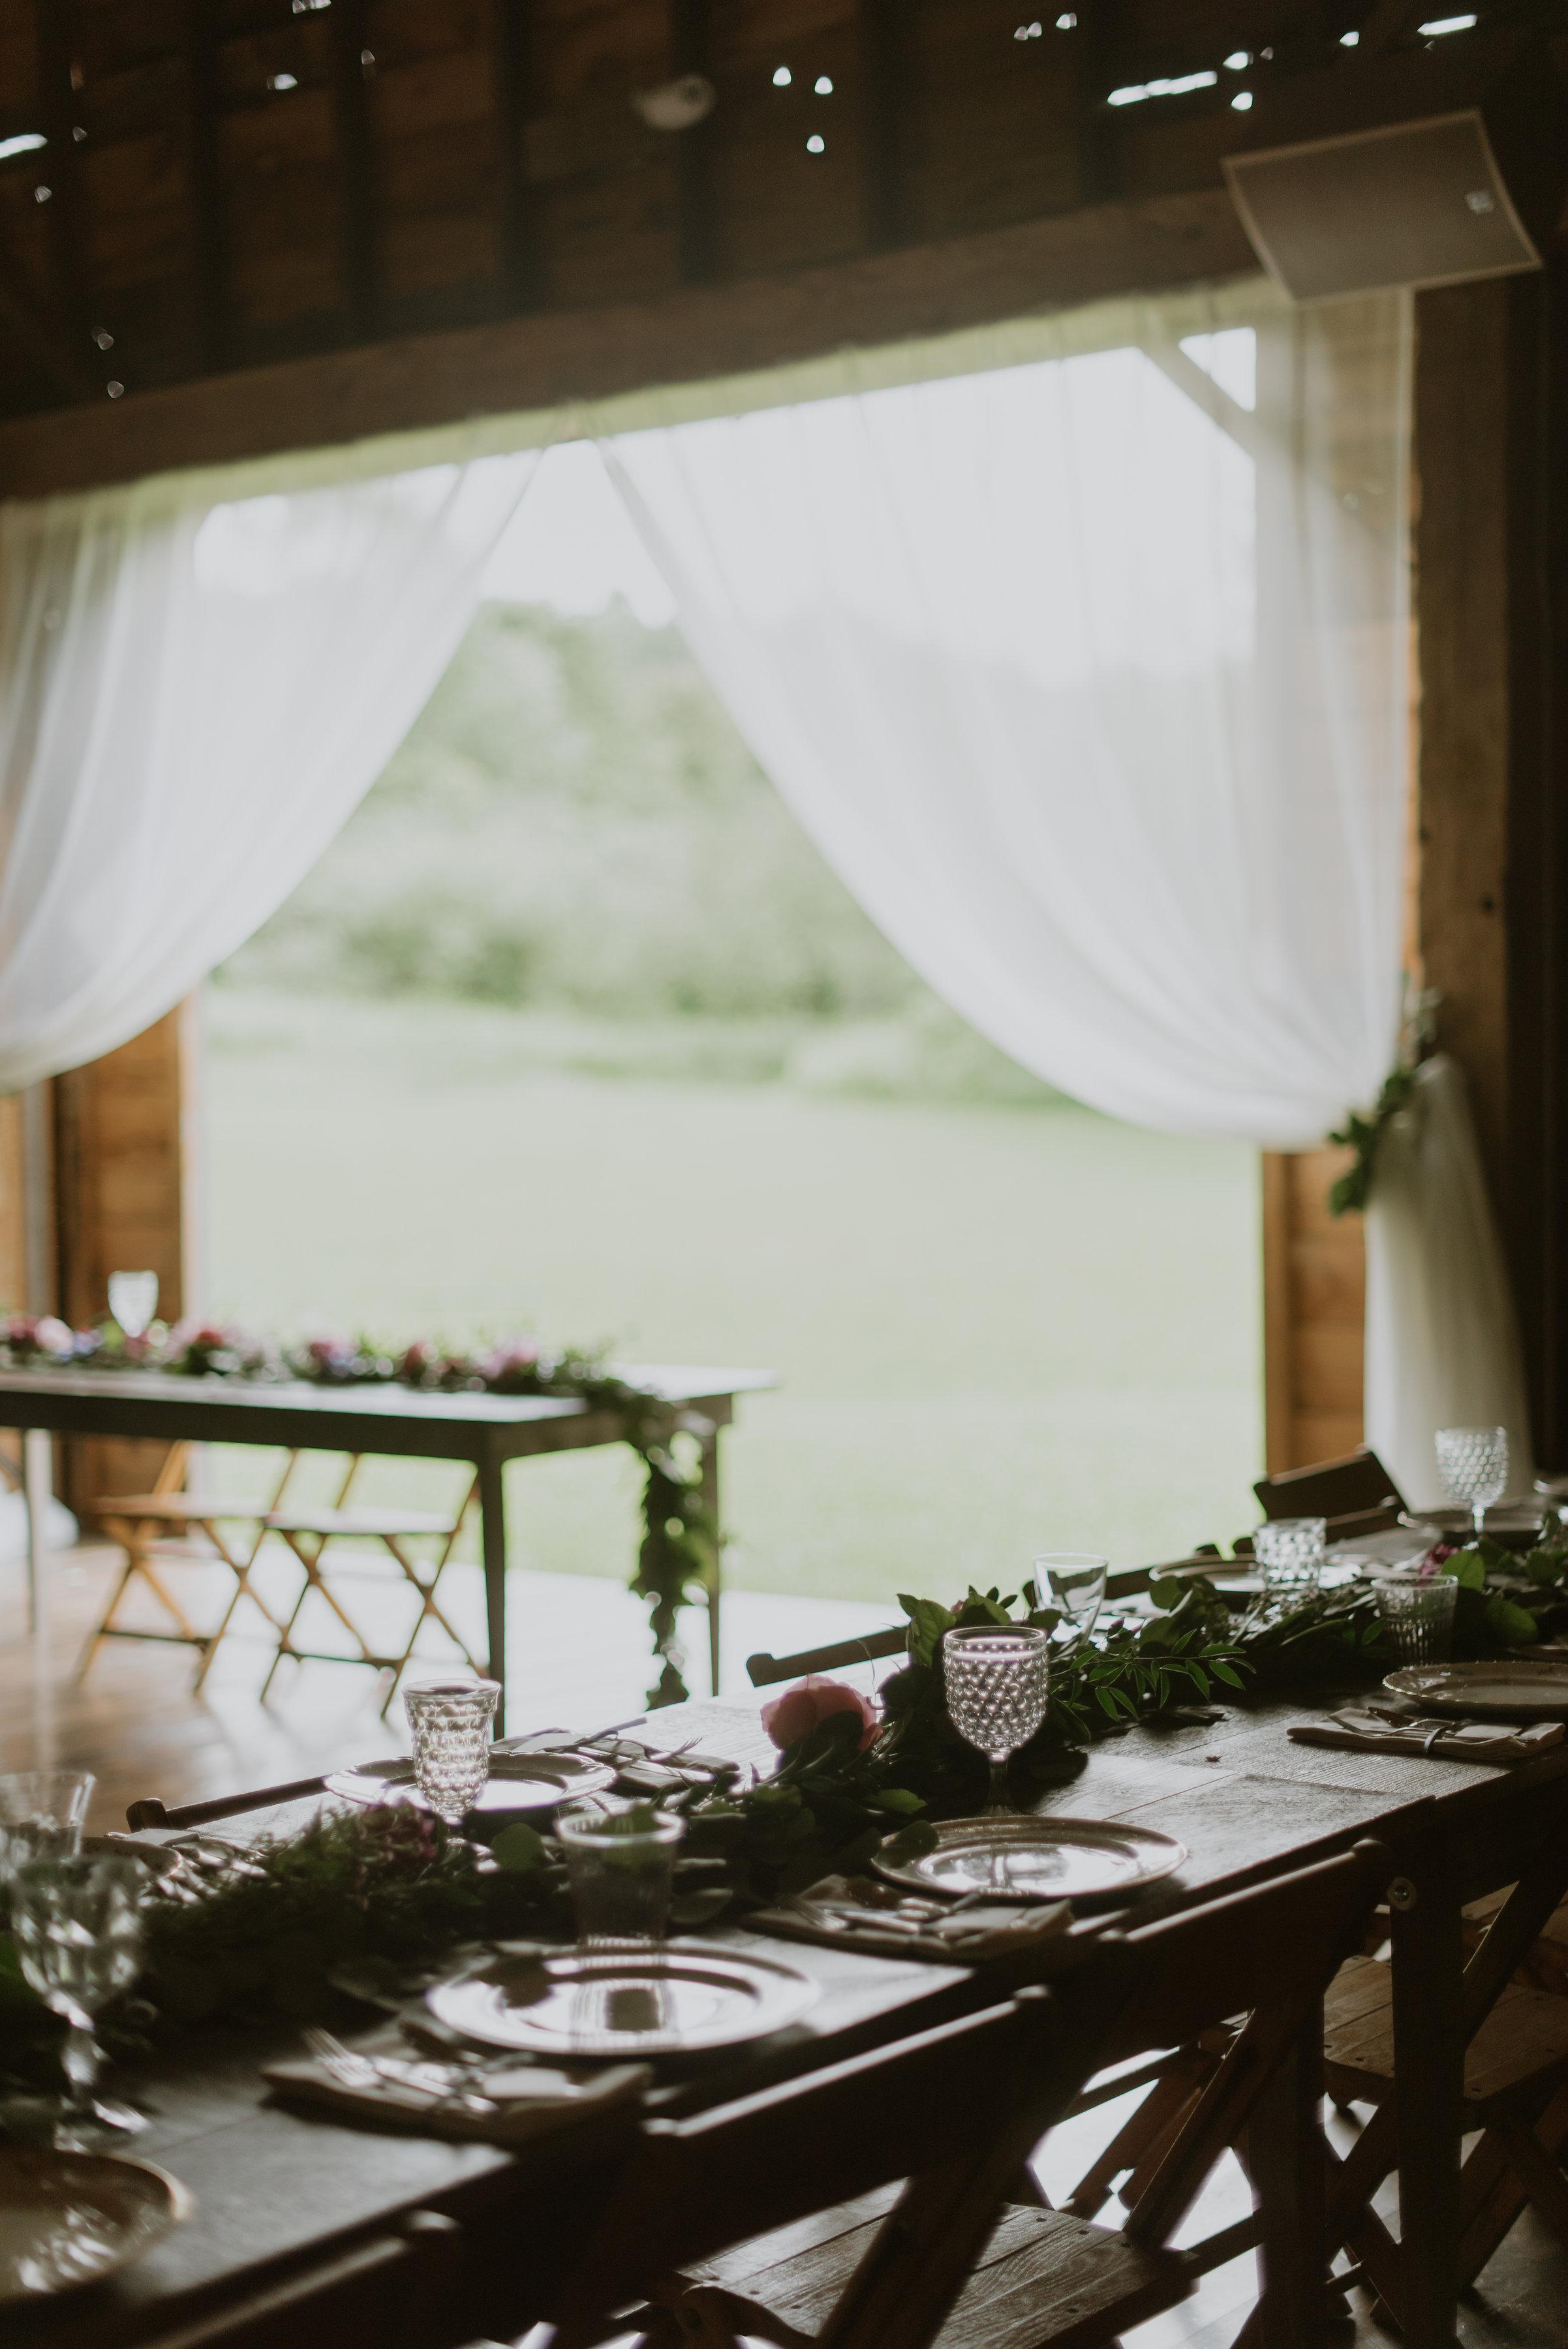 Cassandra-Anu-Wedding-Upstate-Catskills-Summer-Meadowlark-Stills-Lawrence-Braun-FINAL-0005.jpg